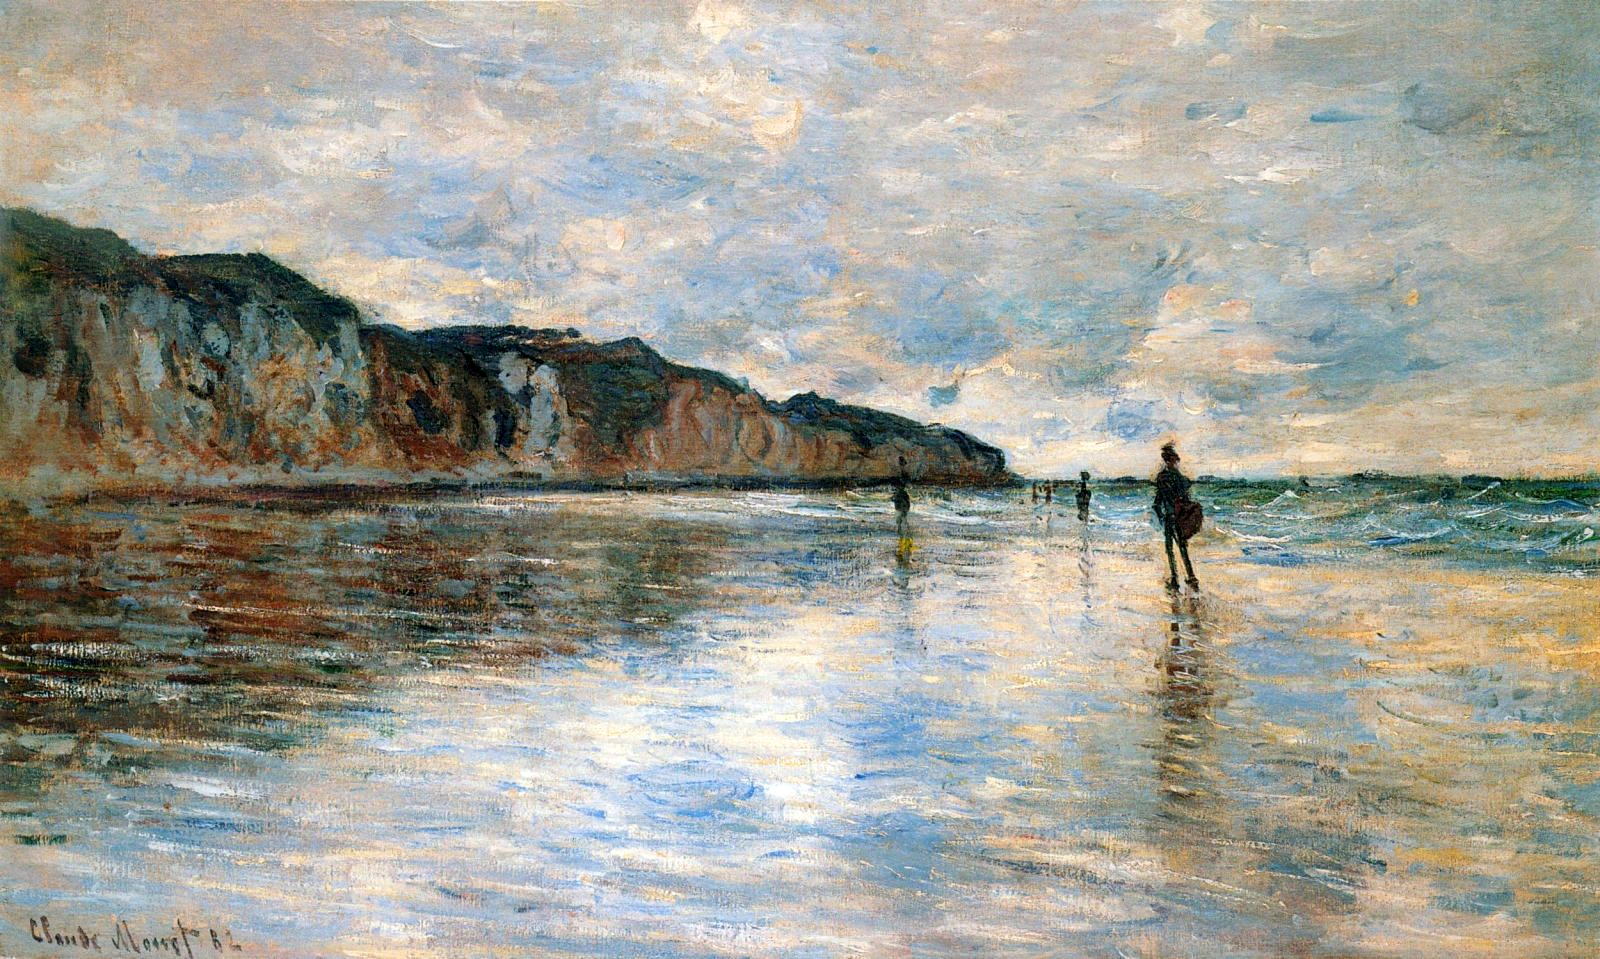 ������� - ��������� < �������� �� ����� ������ >:: ���� ����, �������� ������� - ���� ���� (Claude Monet) ����